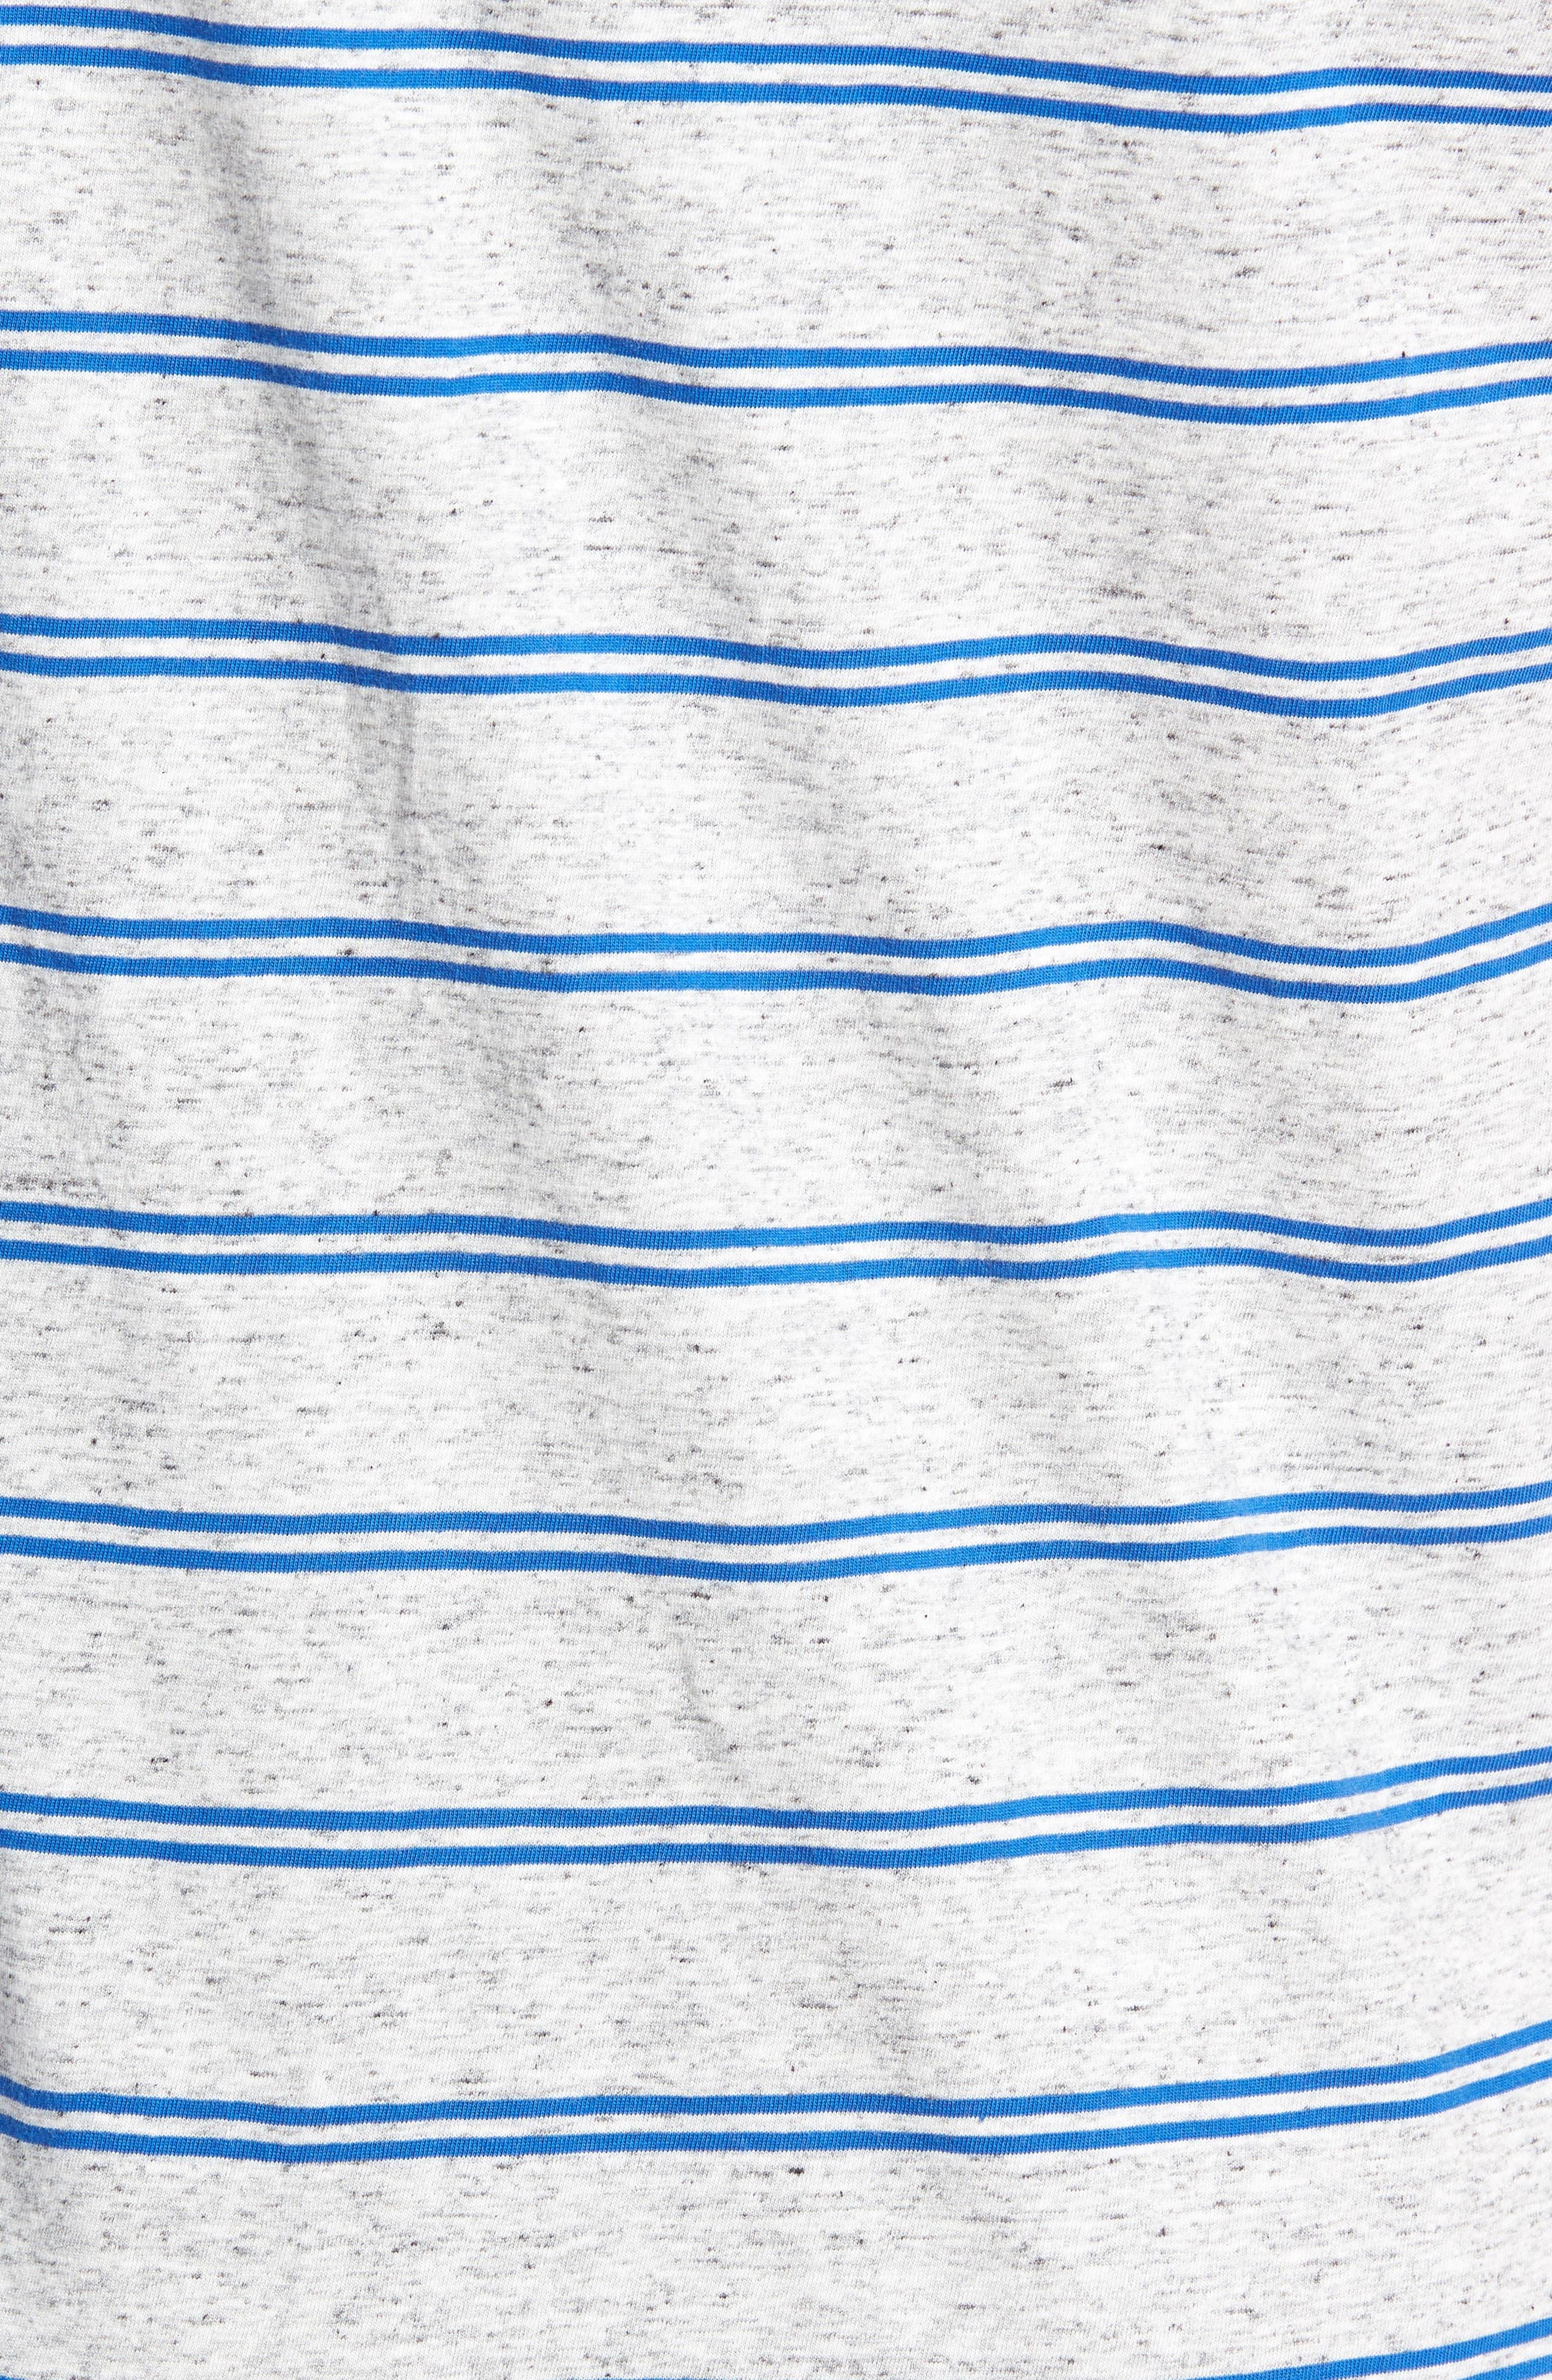 Flintlock T-Shirt,                             Alternate thumbnail 5, color,                             STORM MARLE/ COBALT